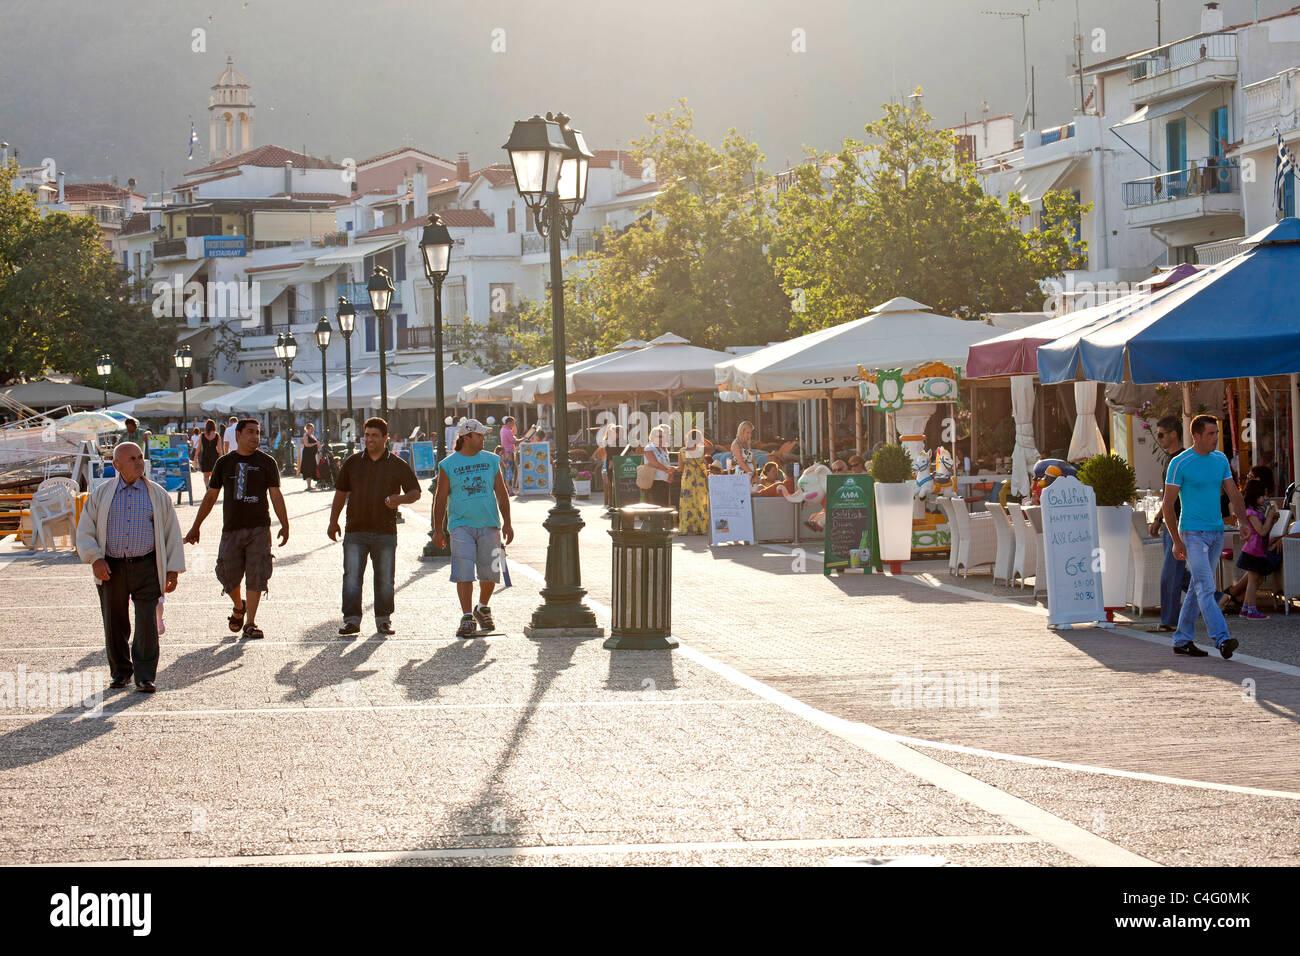 restaurants at the promenade of the old harbour of Skiathos Town, Skiathos Island, Northern Sporades, Greece  - Stock Image